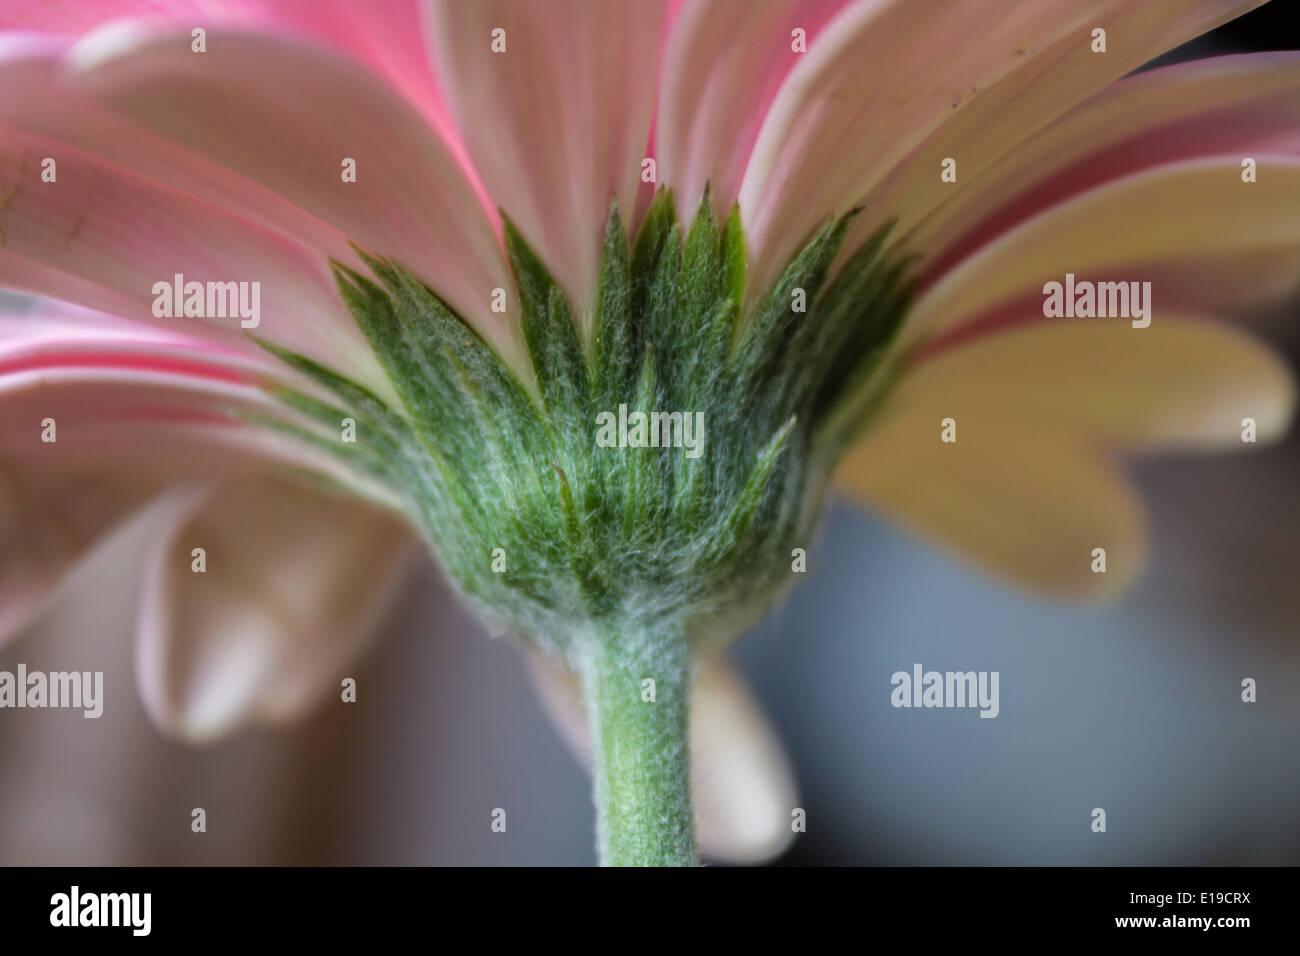 Underside Daisy Flower Stock Photos Underside Daisy Flower Stock